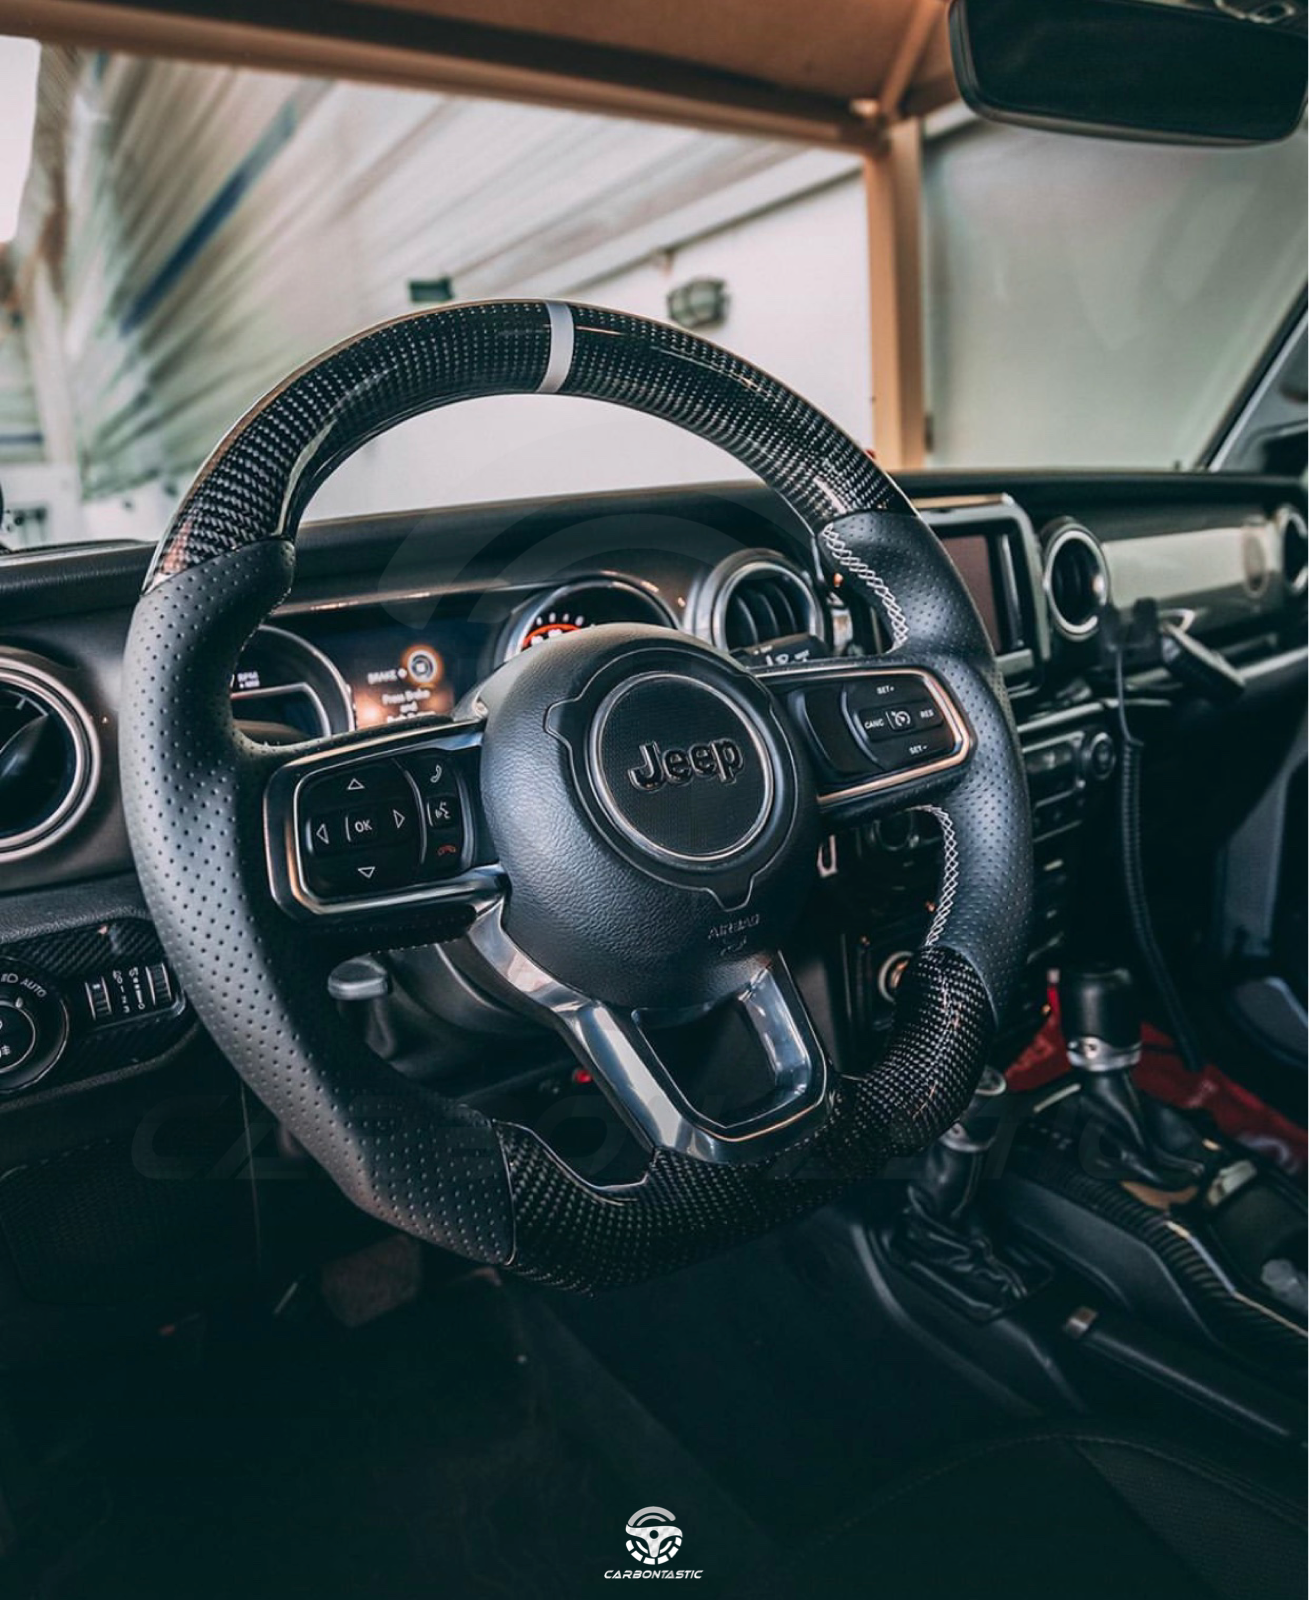 Voodonala for Jeep JL ABS Carbon Fiber Steering Wheel Cover Trim for 2018-2020 Jeep Wrangler JL JLU Gladiator JT Trunk